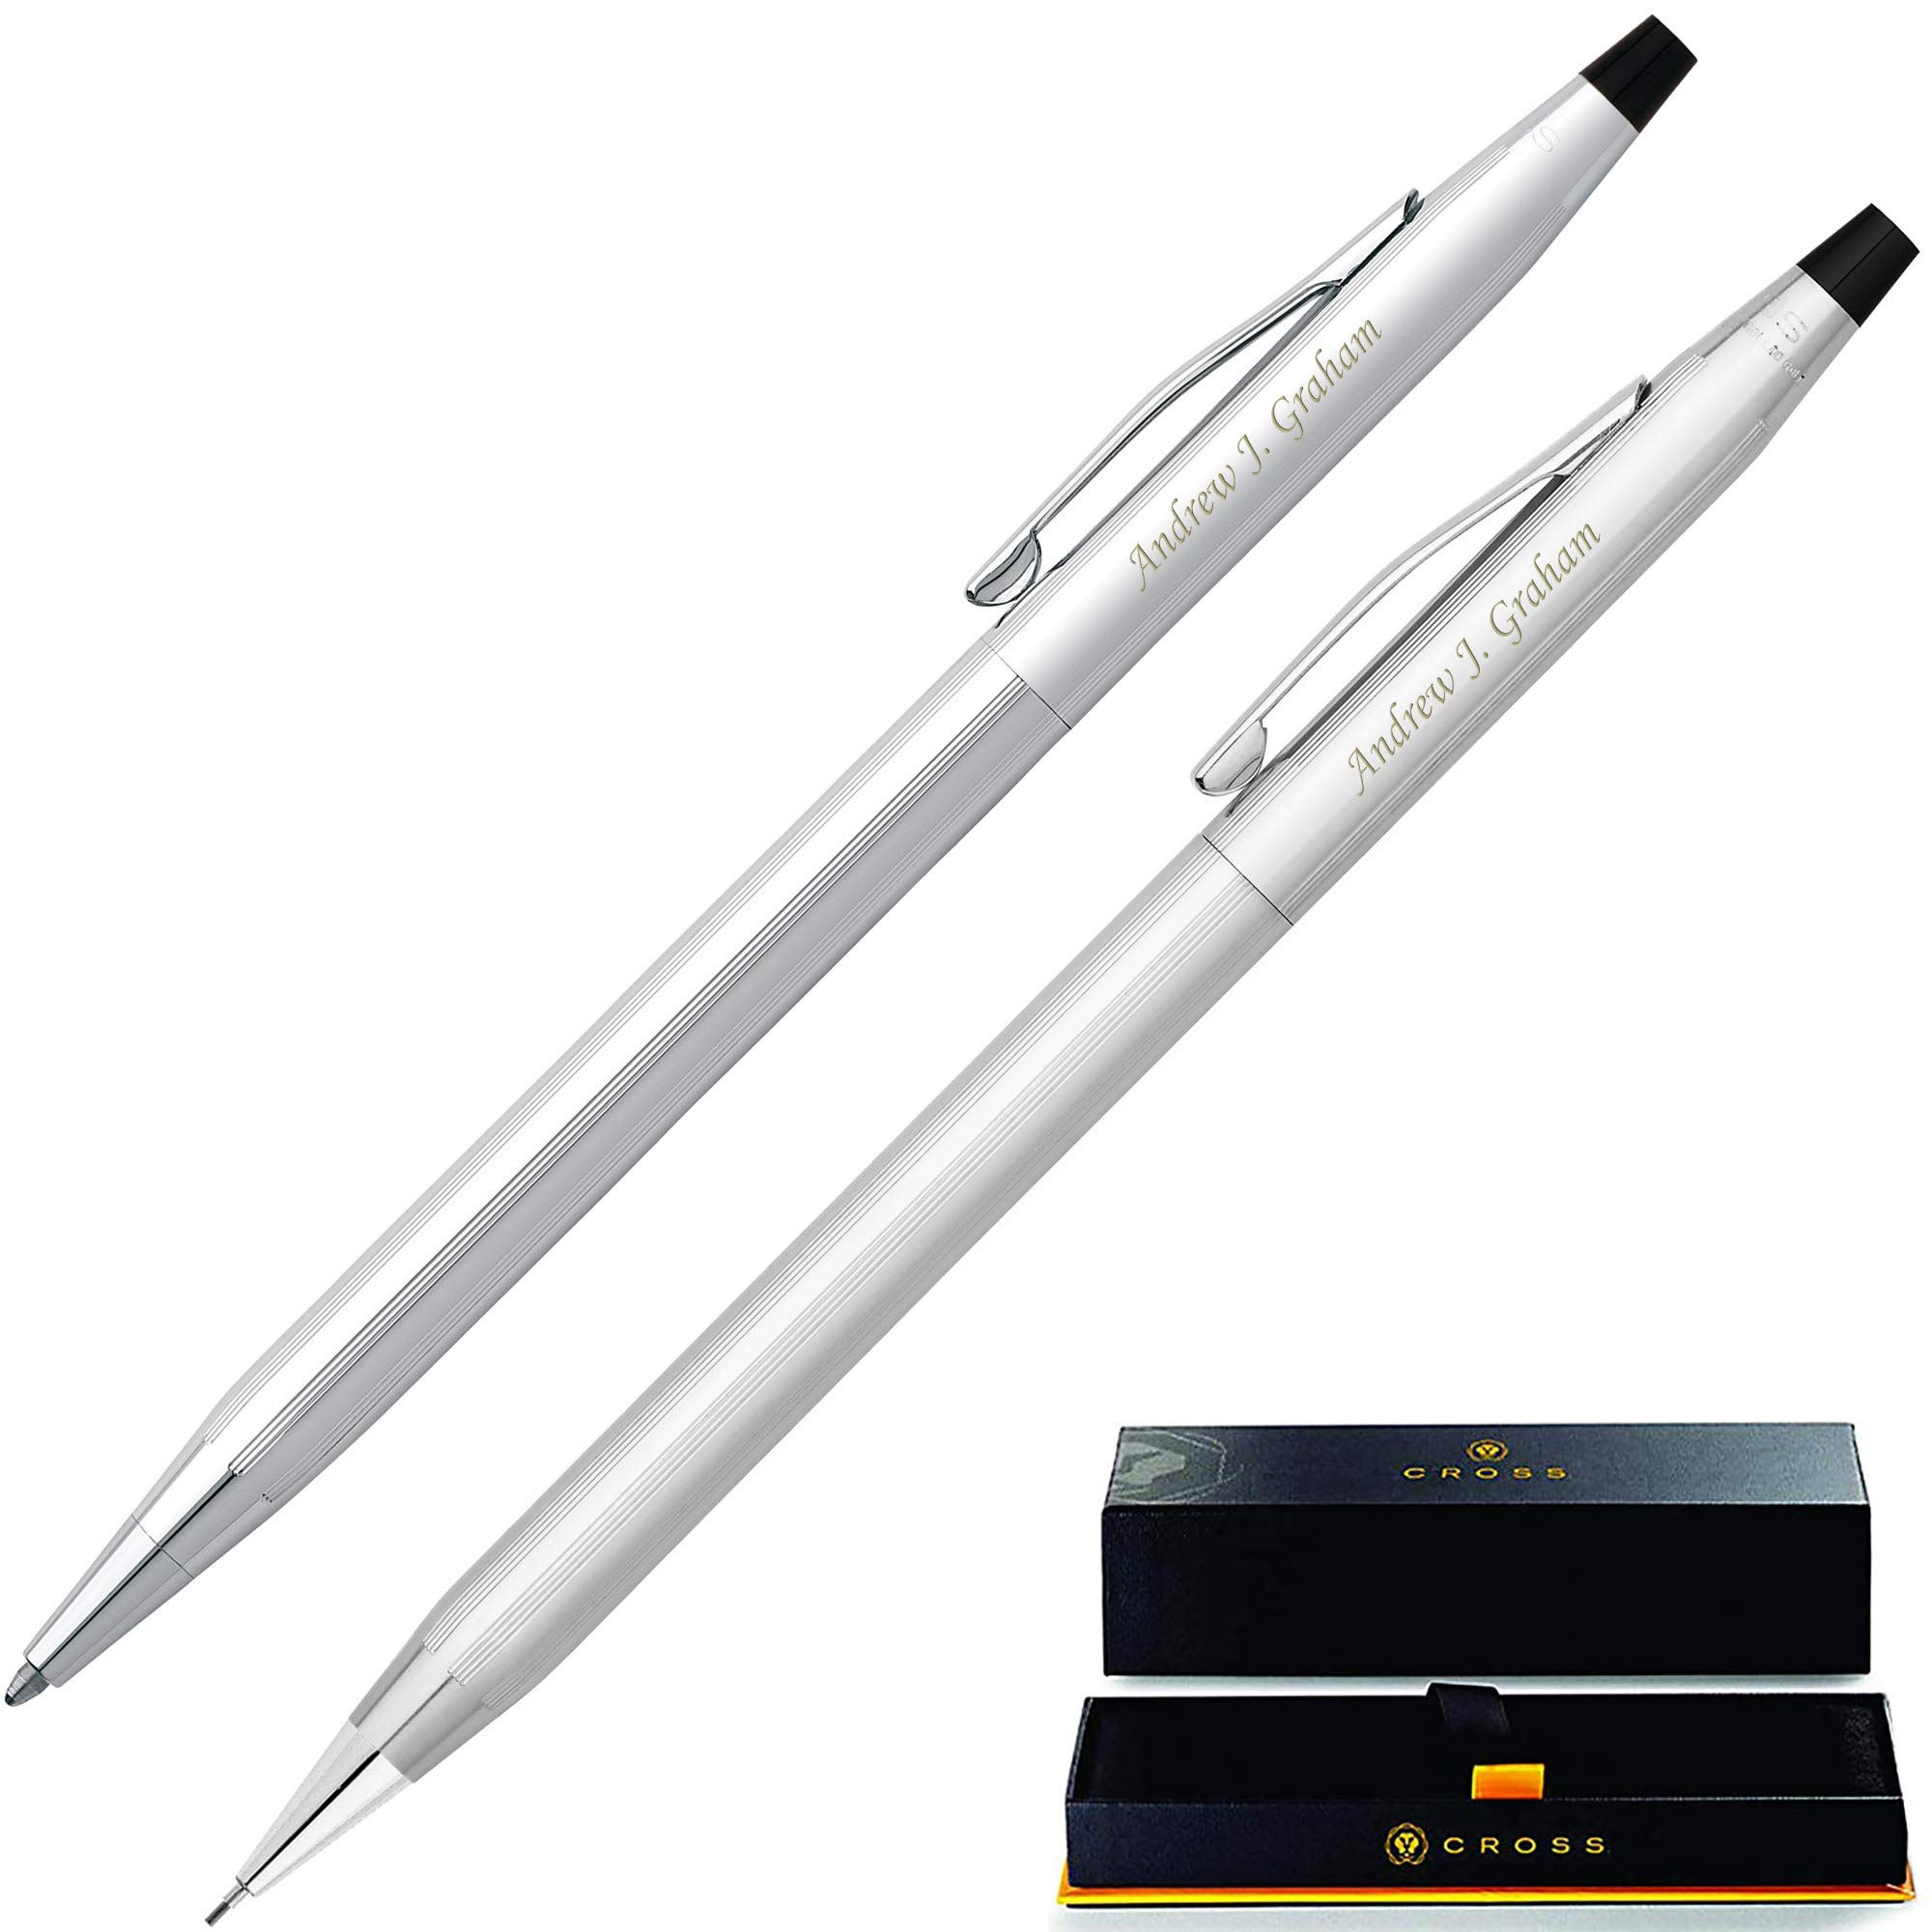 Personalized Cross Pen Set   Cross Classic Century Pen & Pencil Gift Set - Lustrous Chrome. Custom Engraved By Dayspring Pens!